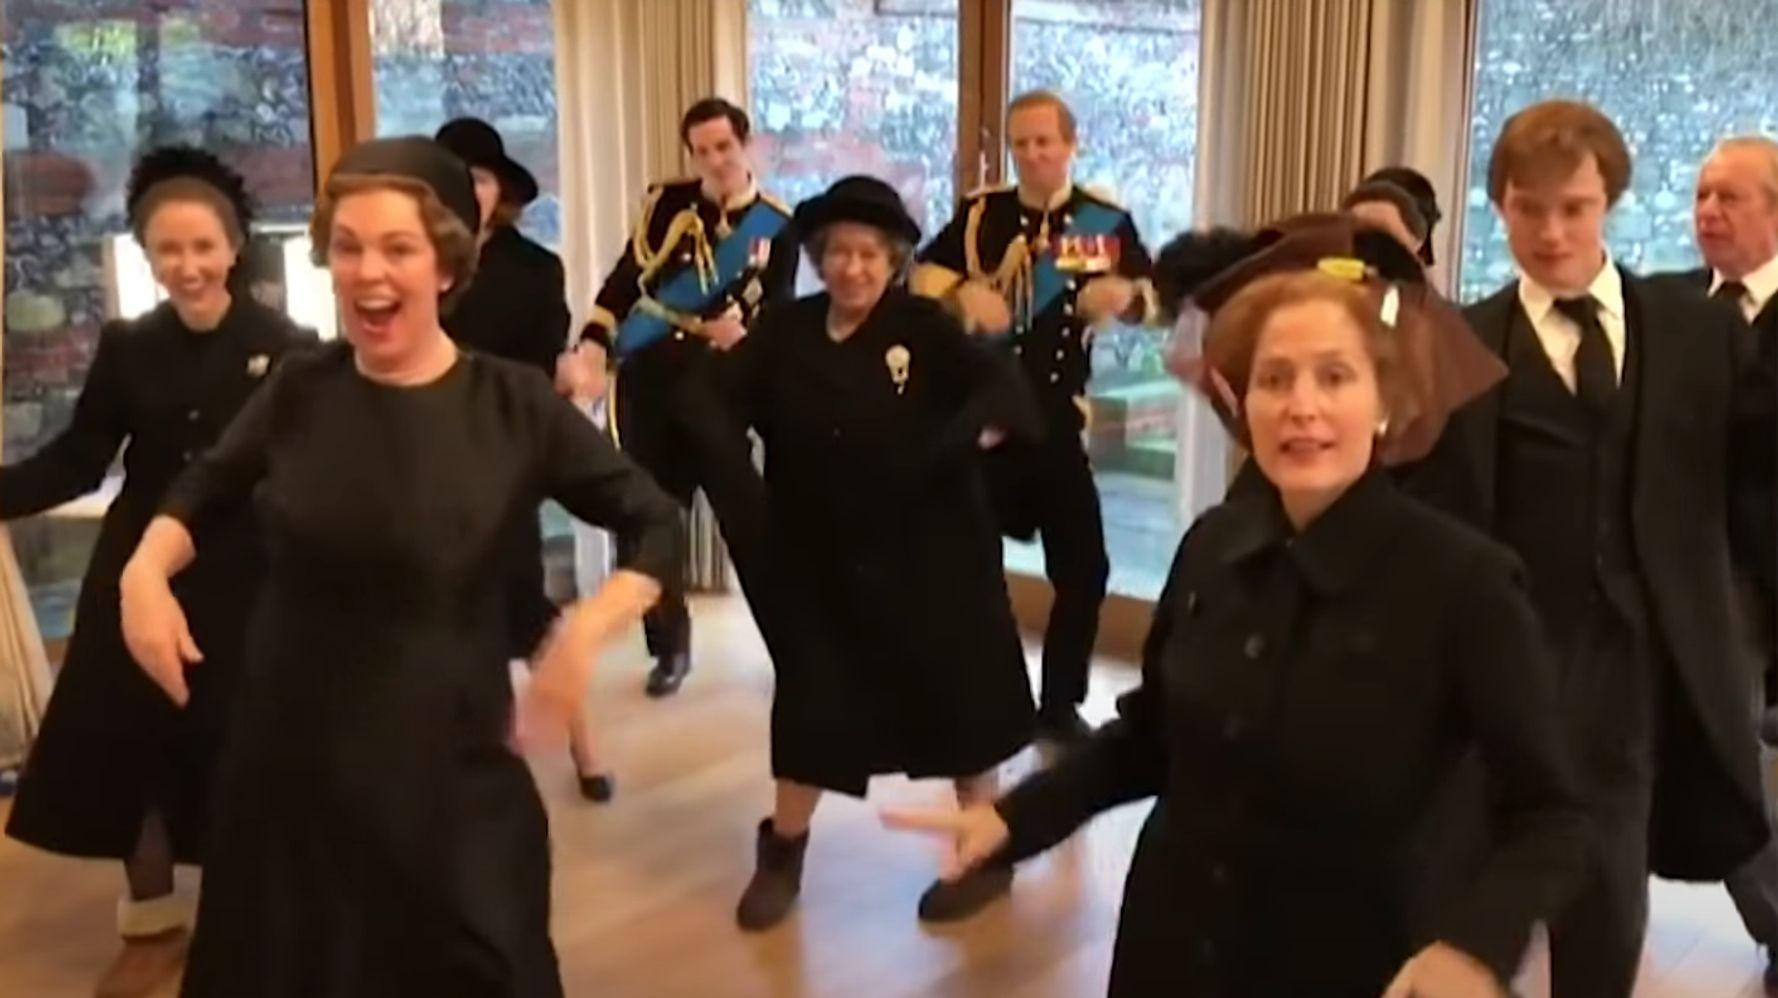 Звезды «Короны» танцуют под Лиззо в видео «Never Meant to See the Light Of Day»